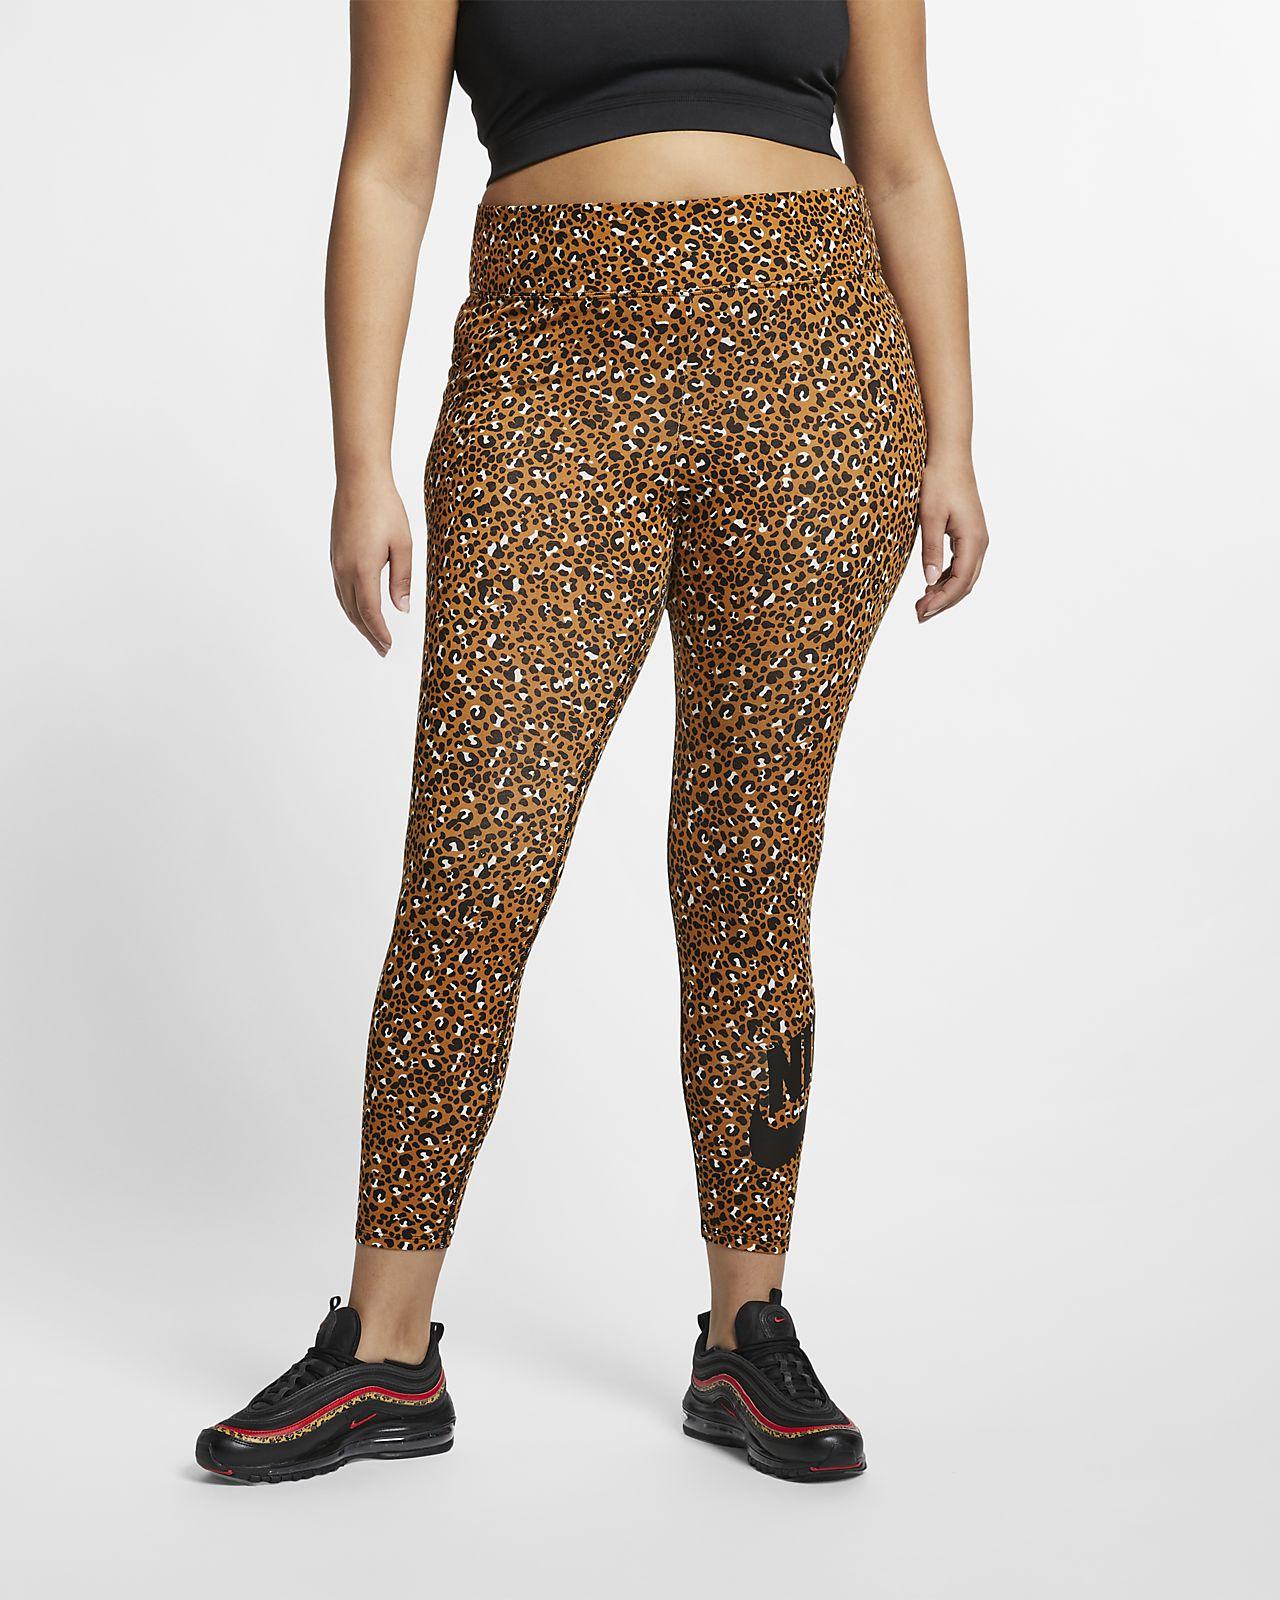 Legging Nike Sportswear Animal Print pour Femme (grande taille)